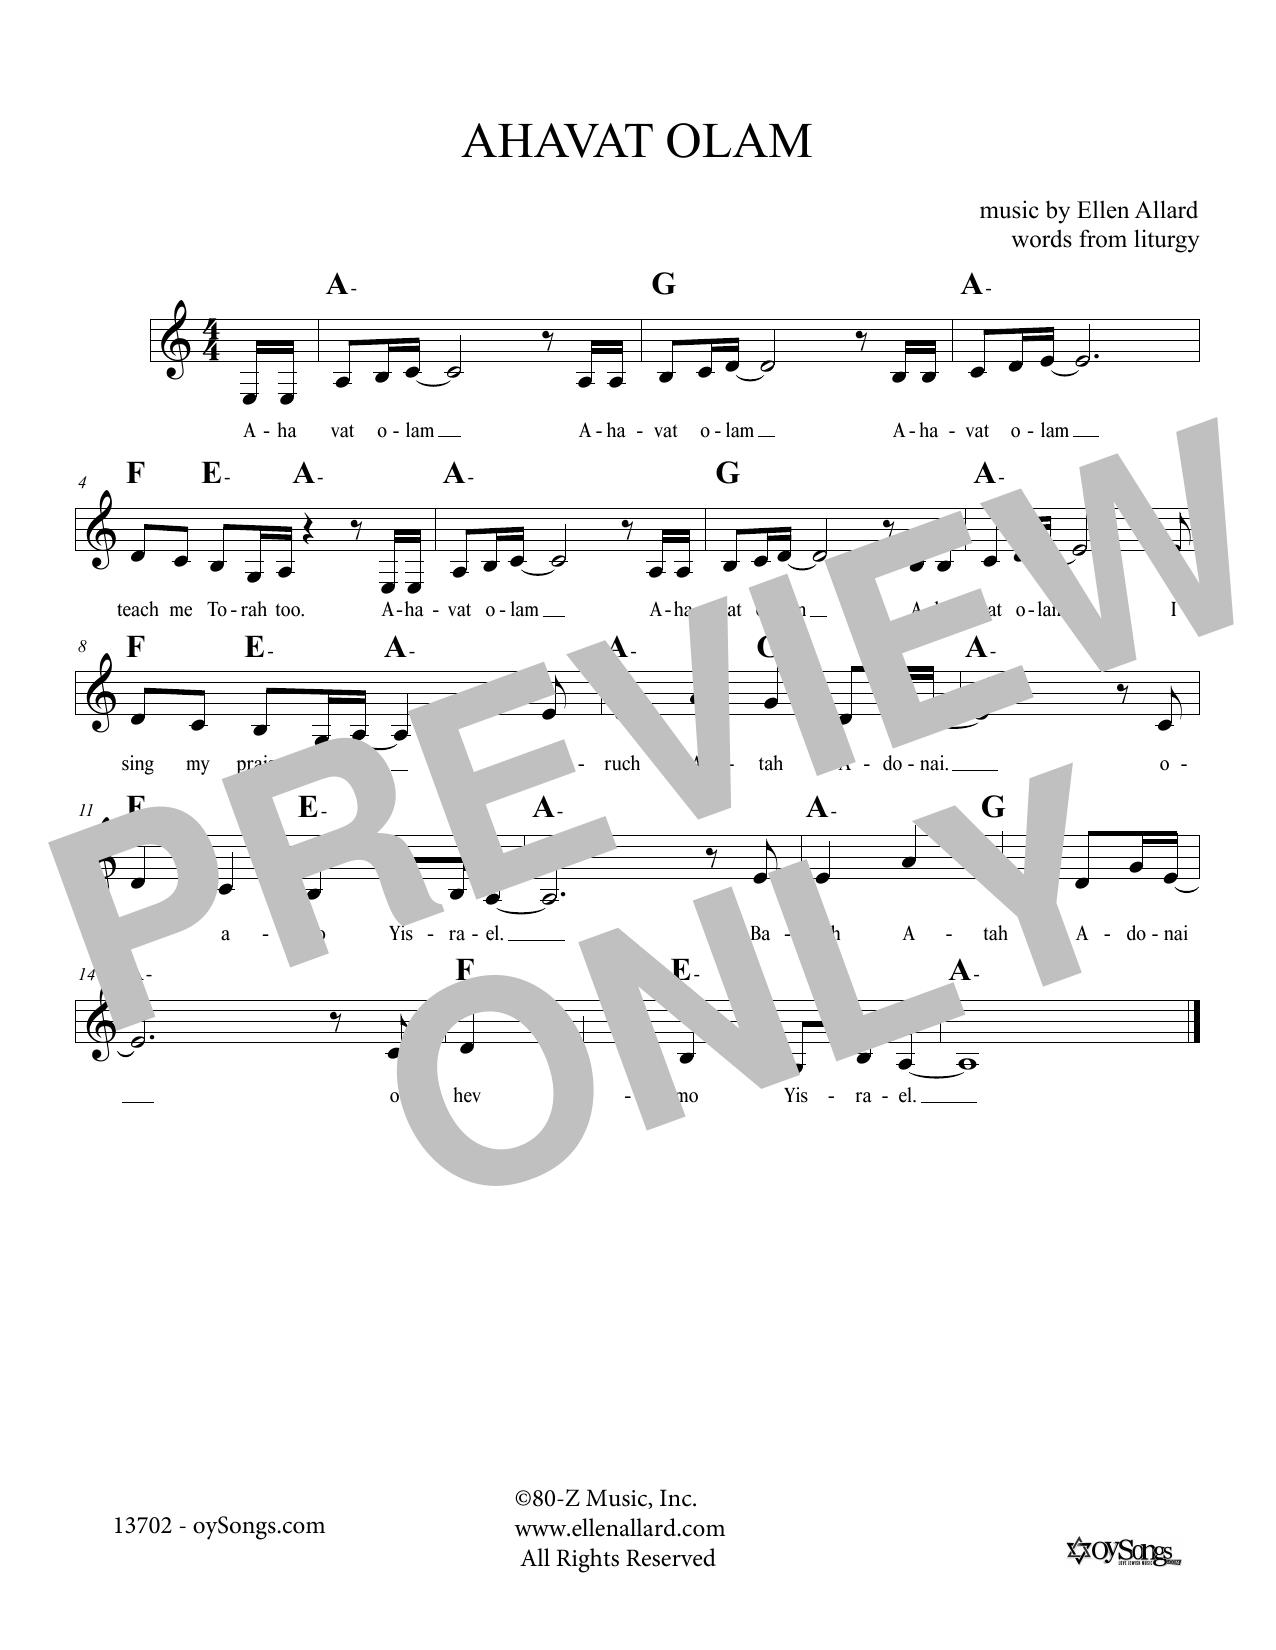 Ellen Allard Ahavat Olam sheet music notes and chords. Download Printable PDF.